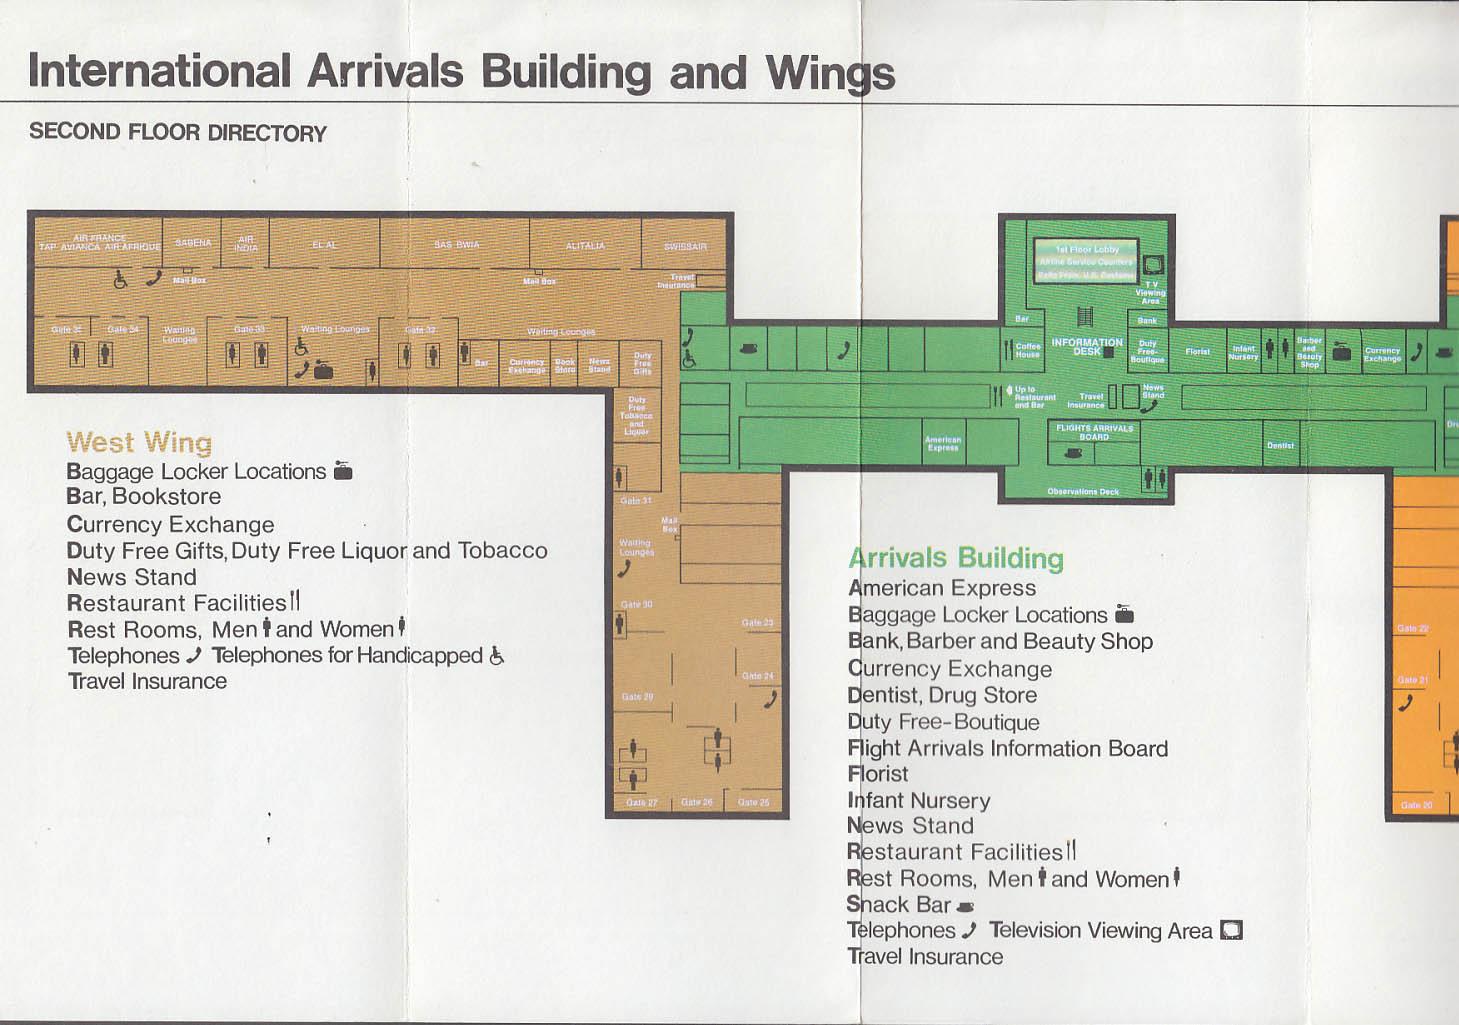 jfk international arrivals building guide airport map 7 1973